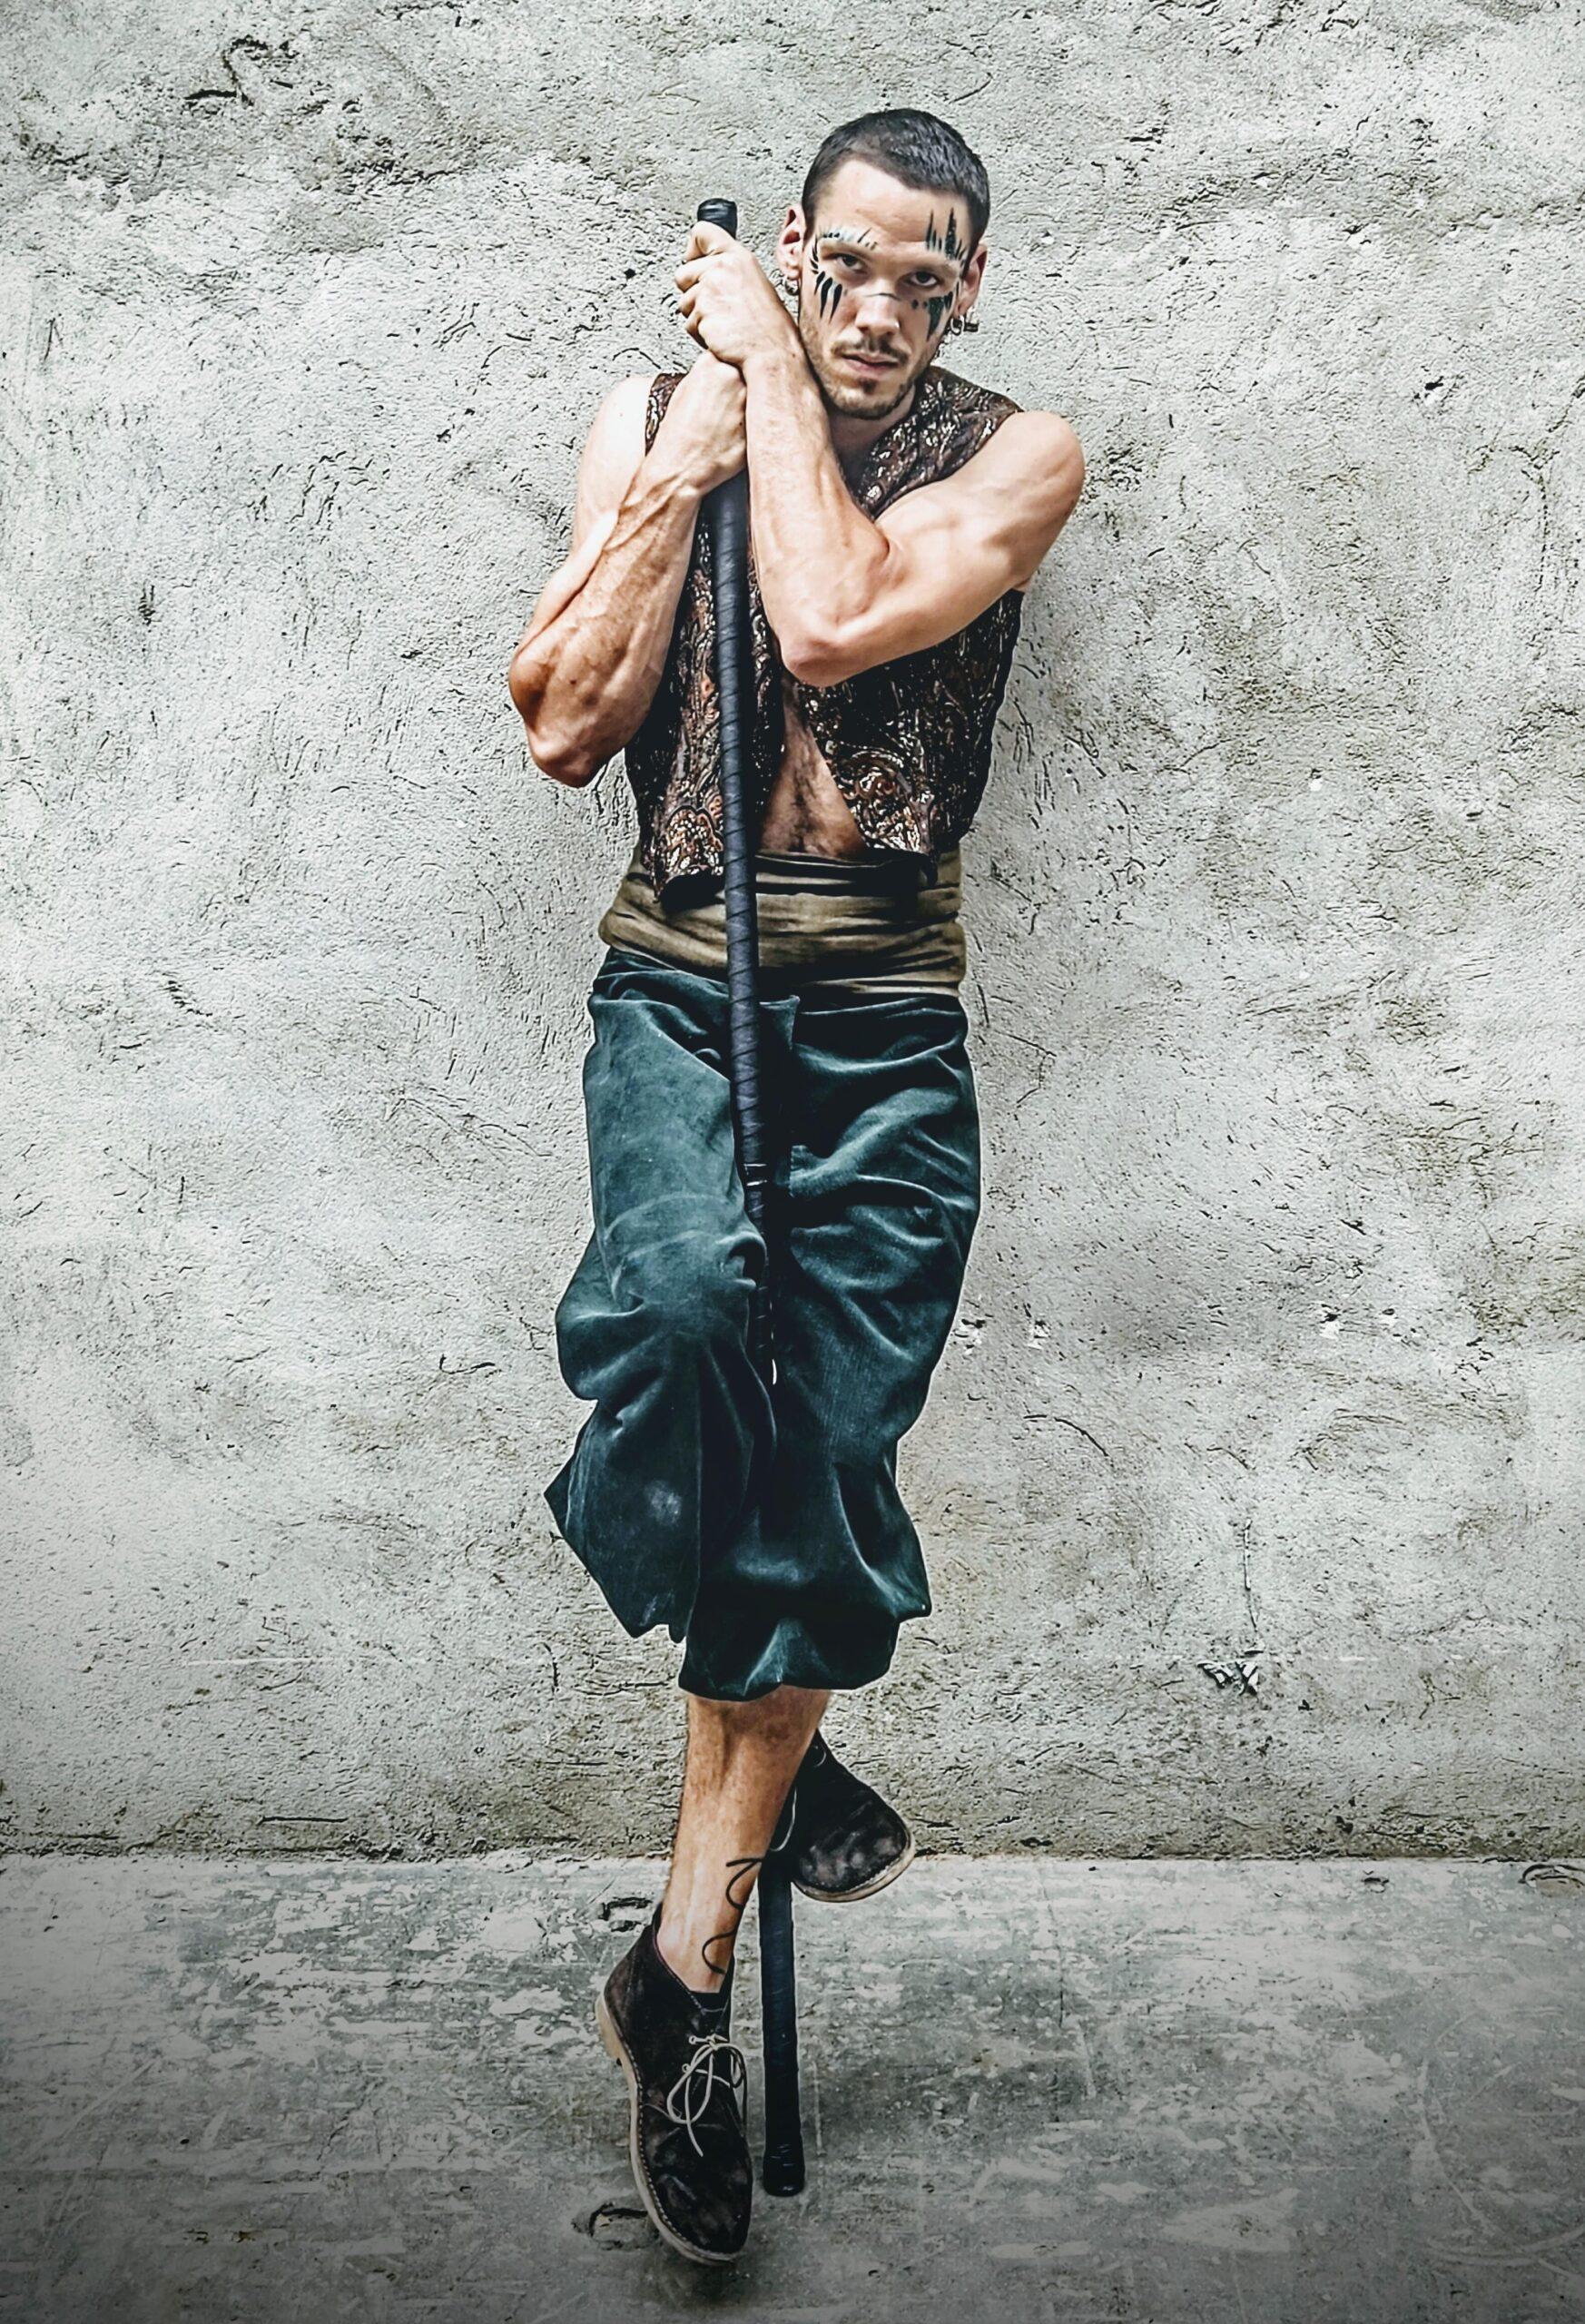 Nicola Colleoni Performarte – The Sanctuary Eco Reatreat Milano – shooting – Acro Staff Performer